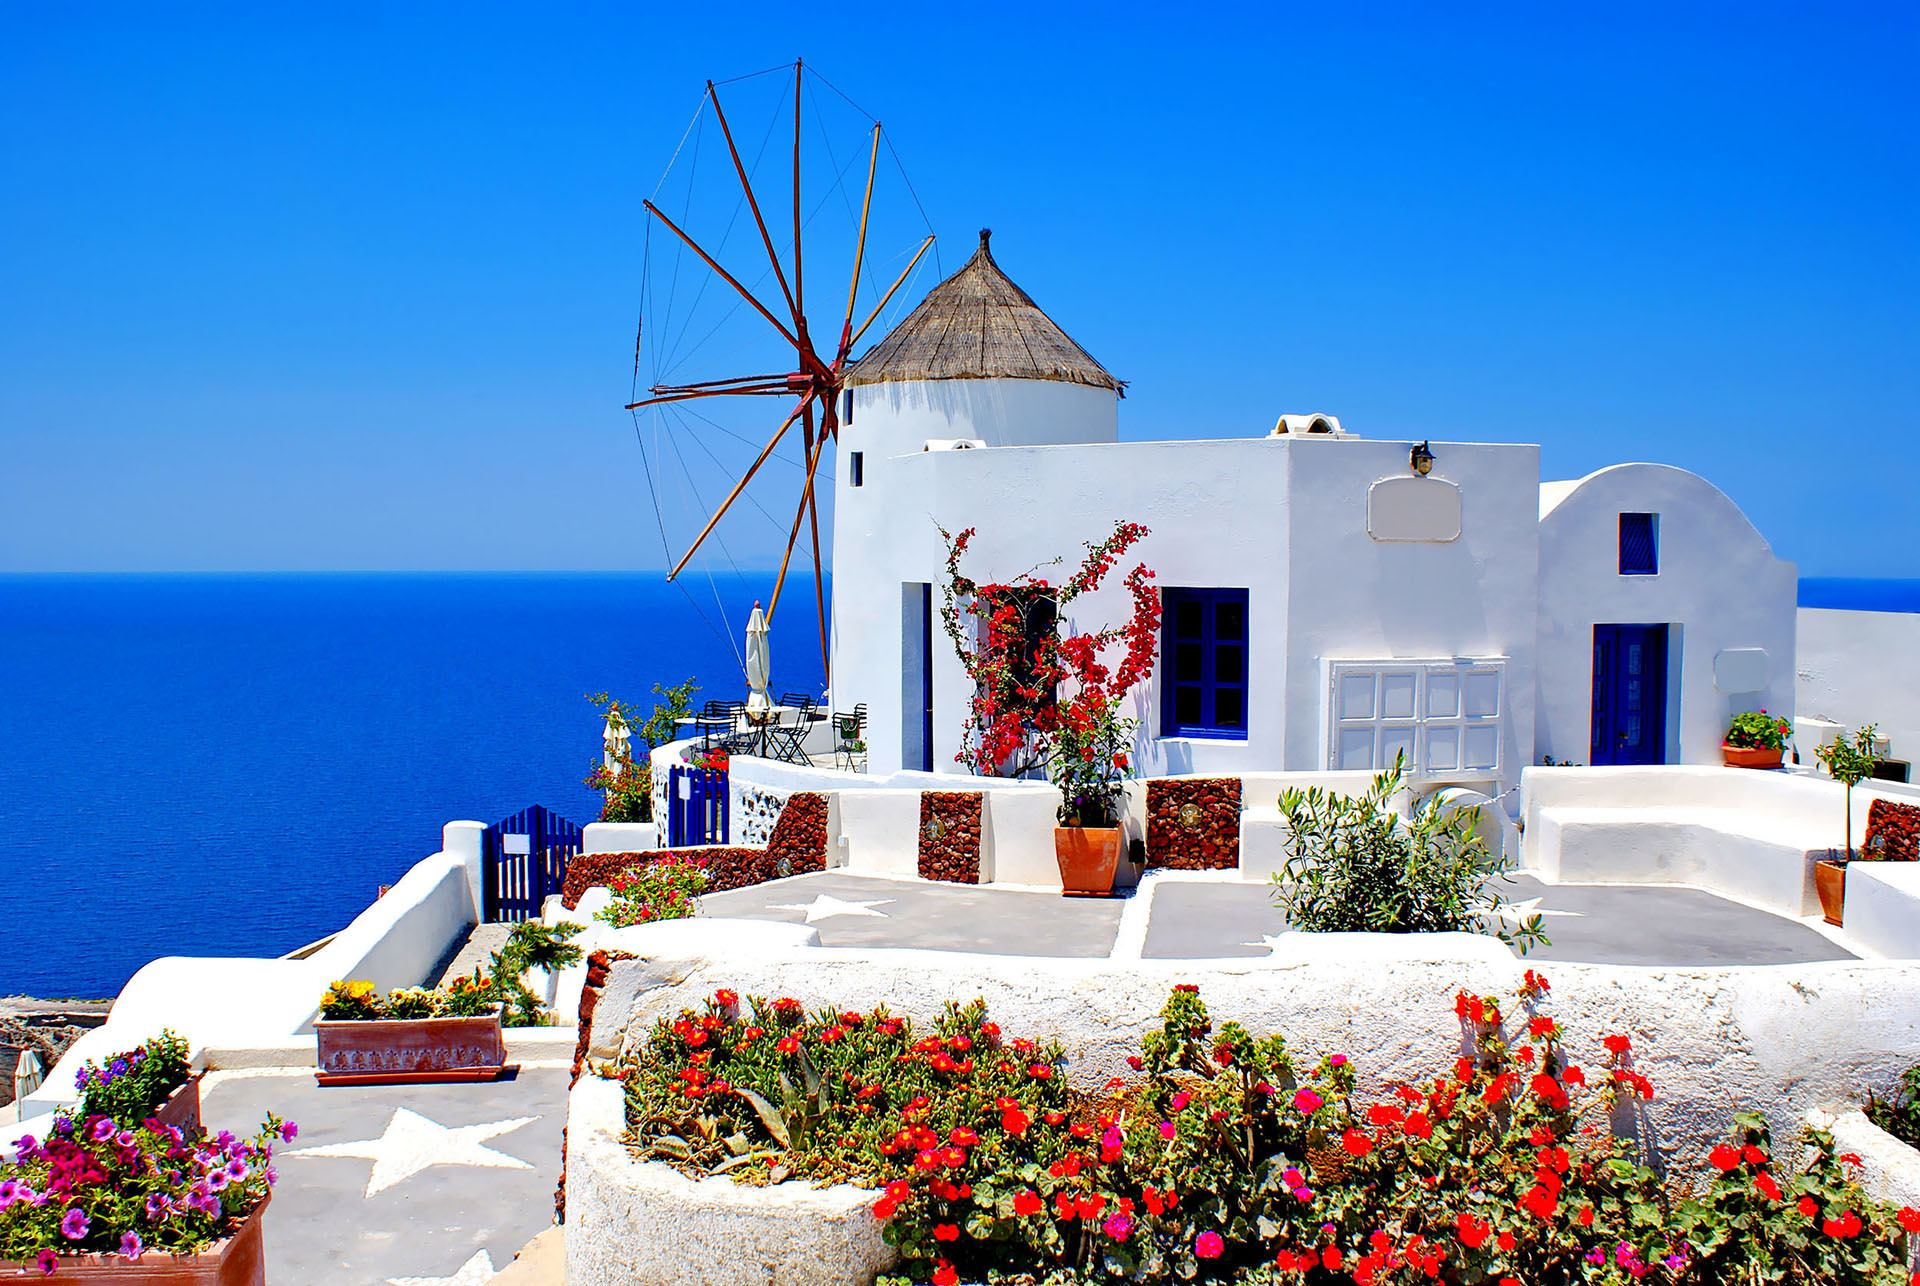 отдых в греции фото далеко